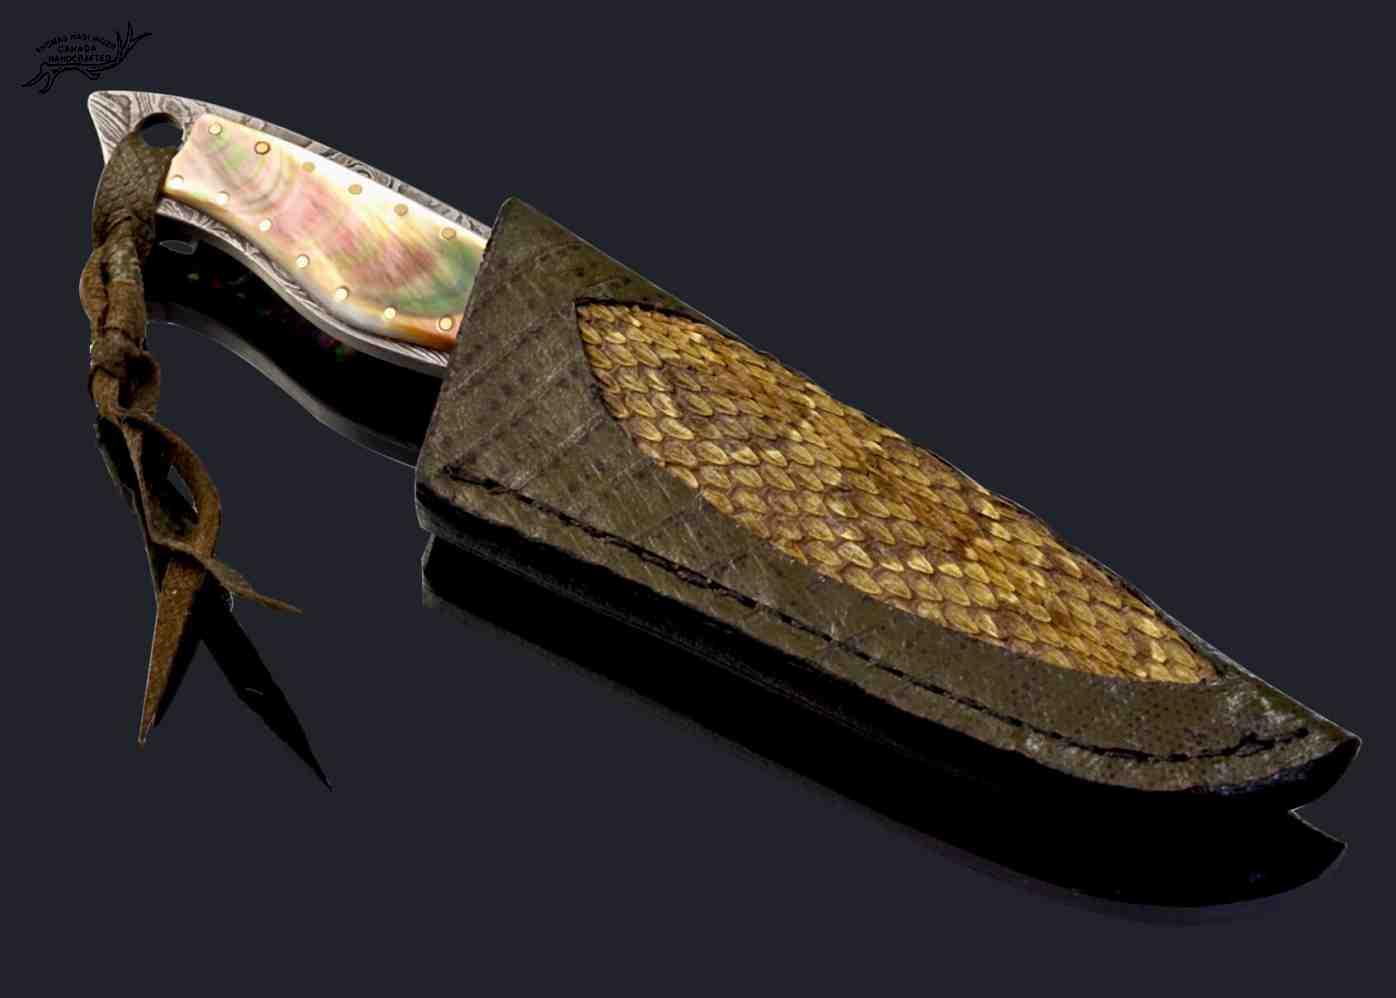 Black Lip Damascus Dress Knife with rattlesnake overlay sheath